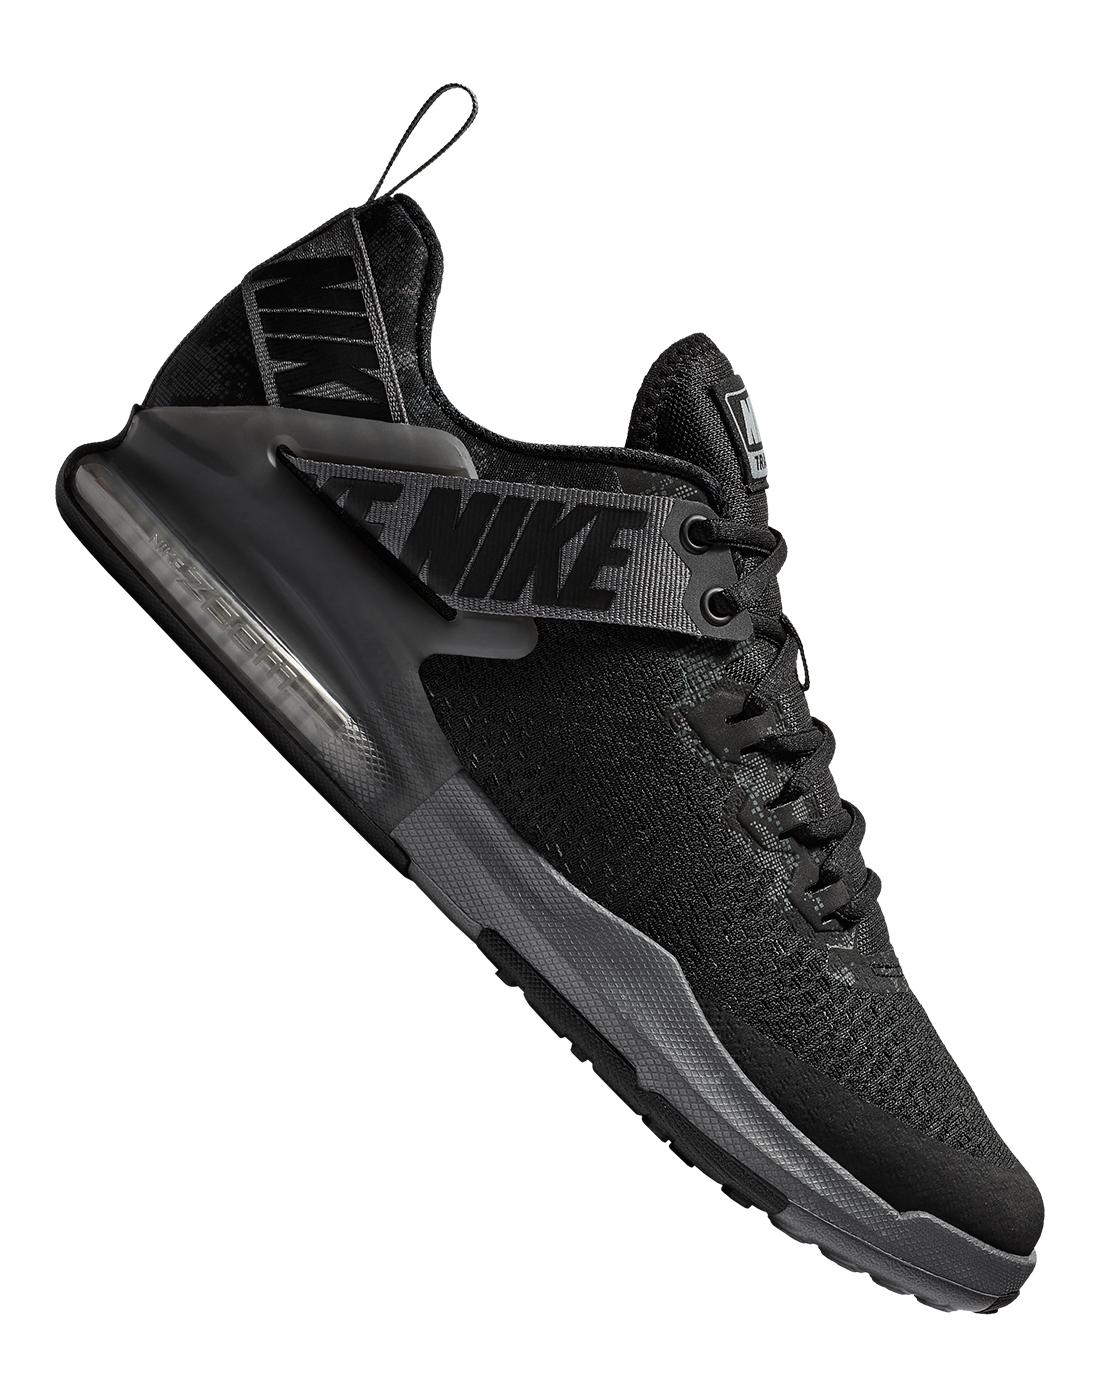 477b2a3df126 Men s Black Nike Zoom Gym Shoes